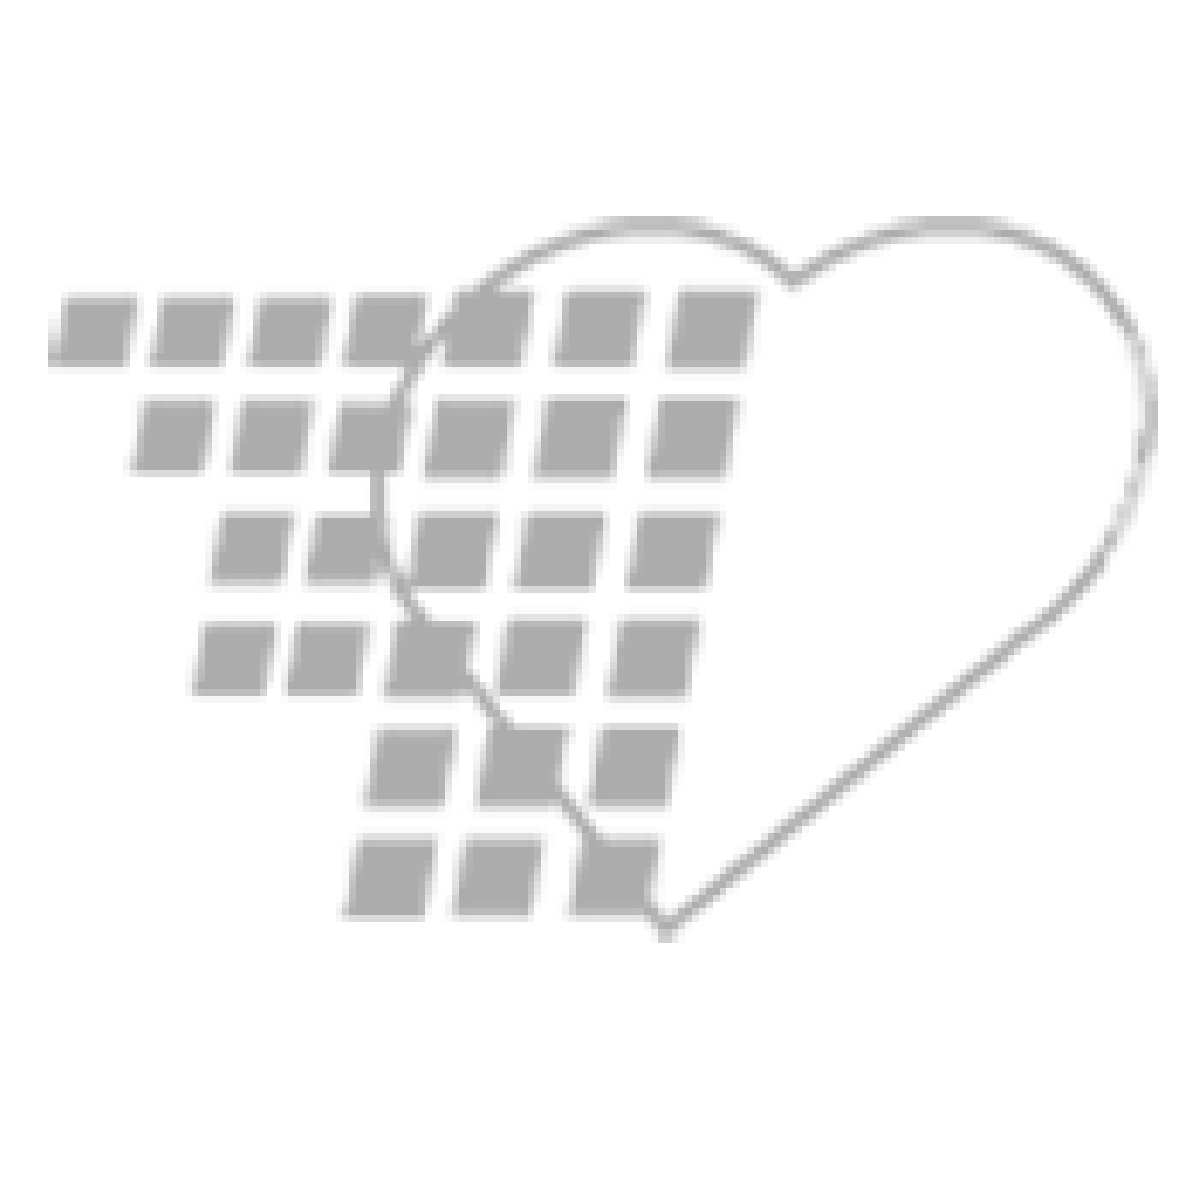 03-75-1413 Critical Cover® GenPro® Beard Covers